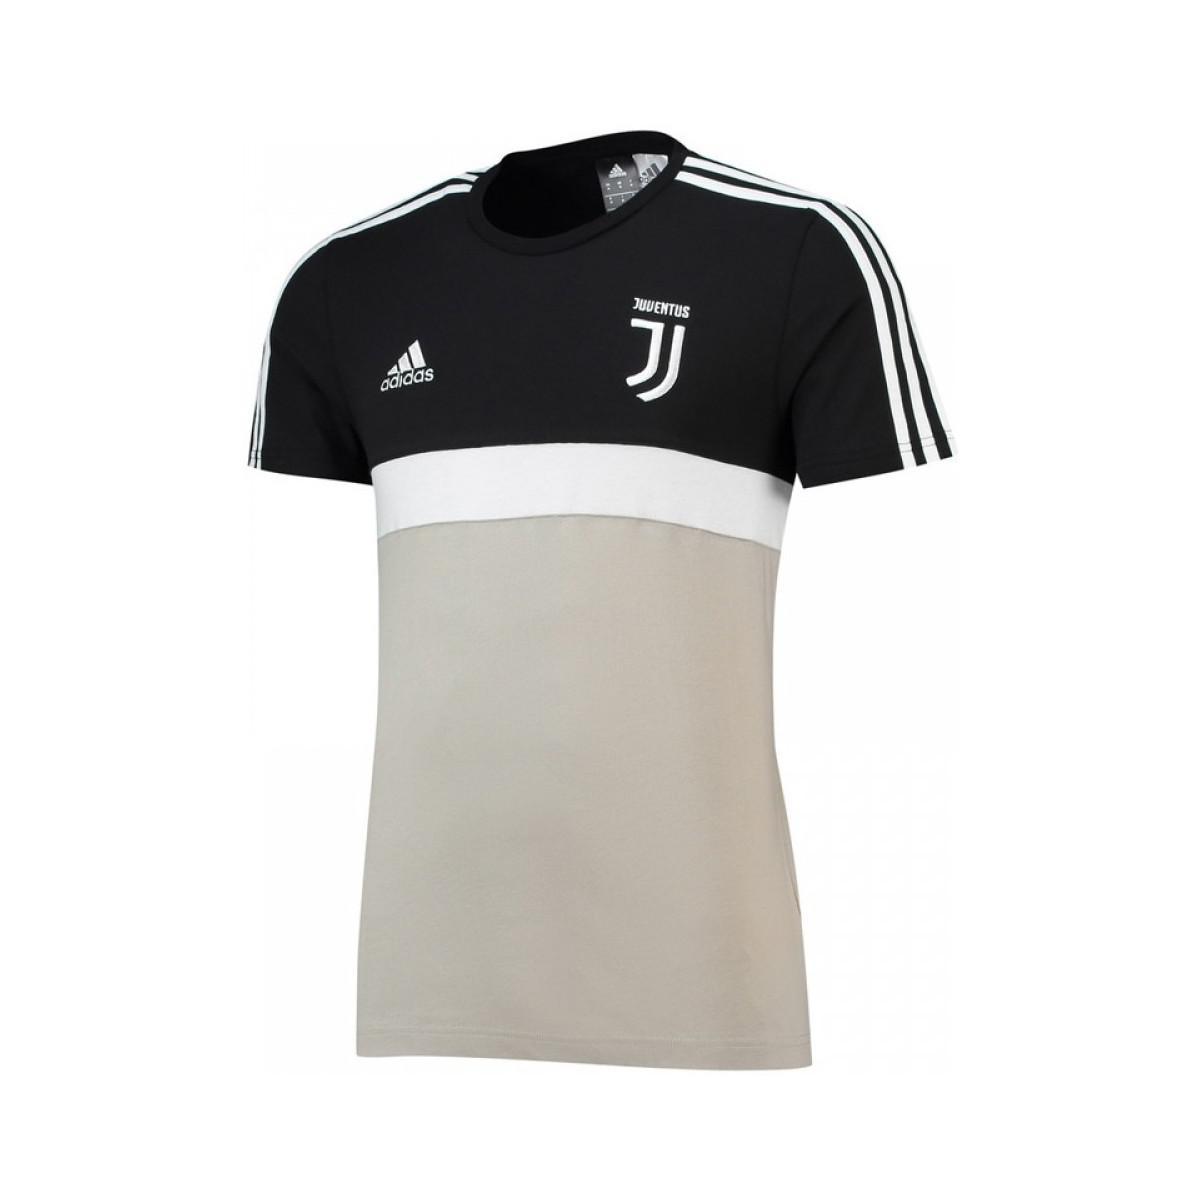 7e24e0546b9 adidas 2018-2019 Juventus 3 Stripe Tee (sesame) Men s T Shirt In ...